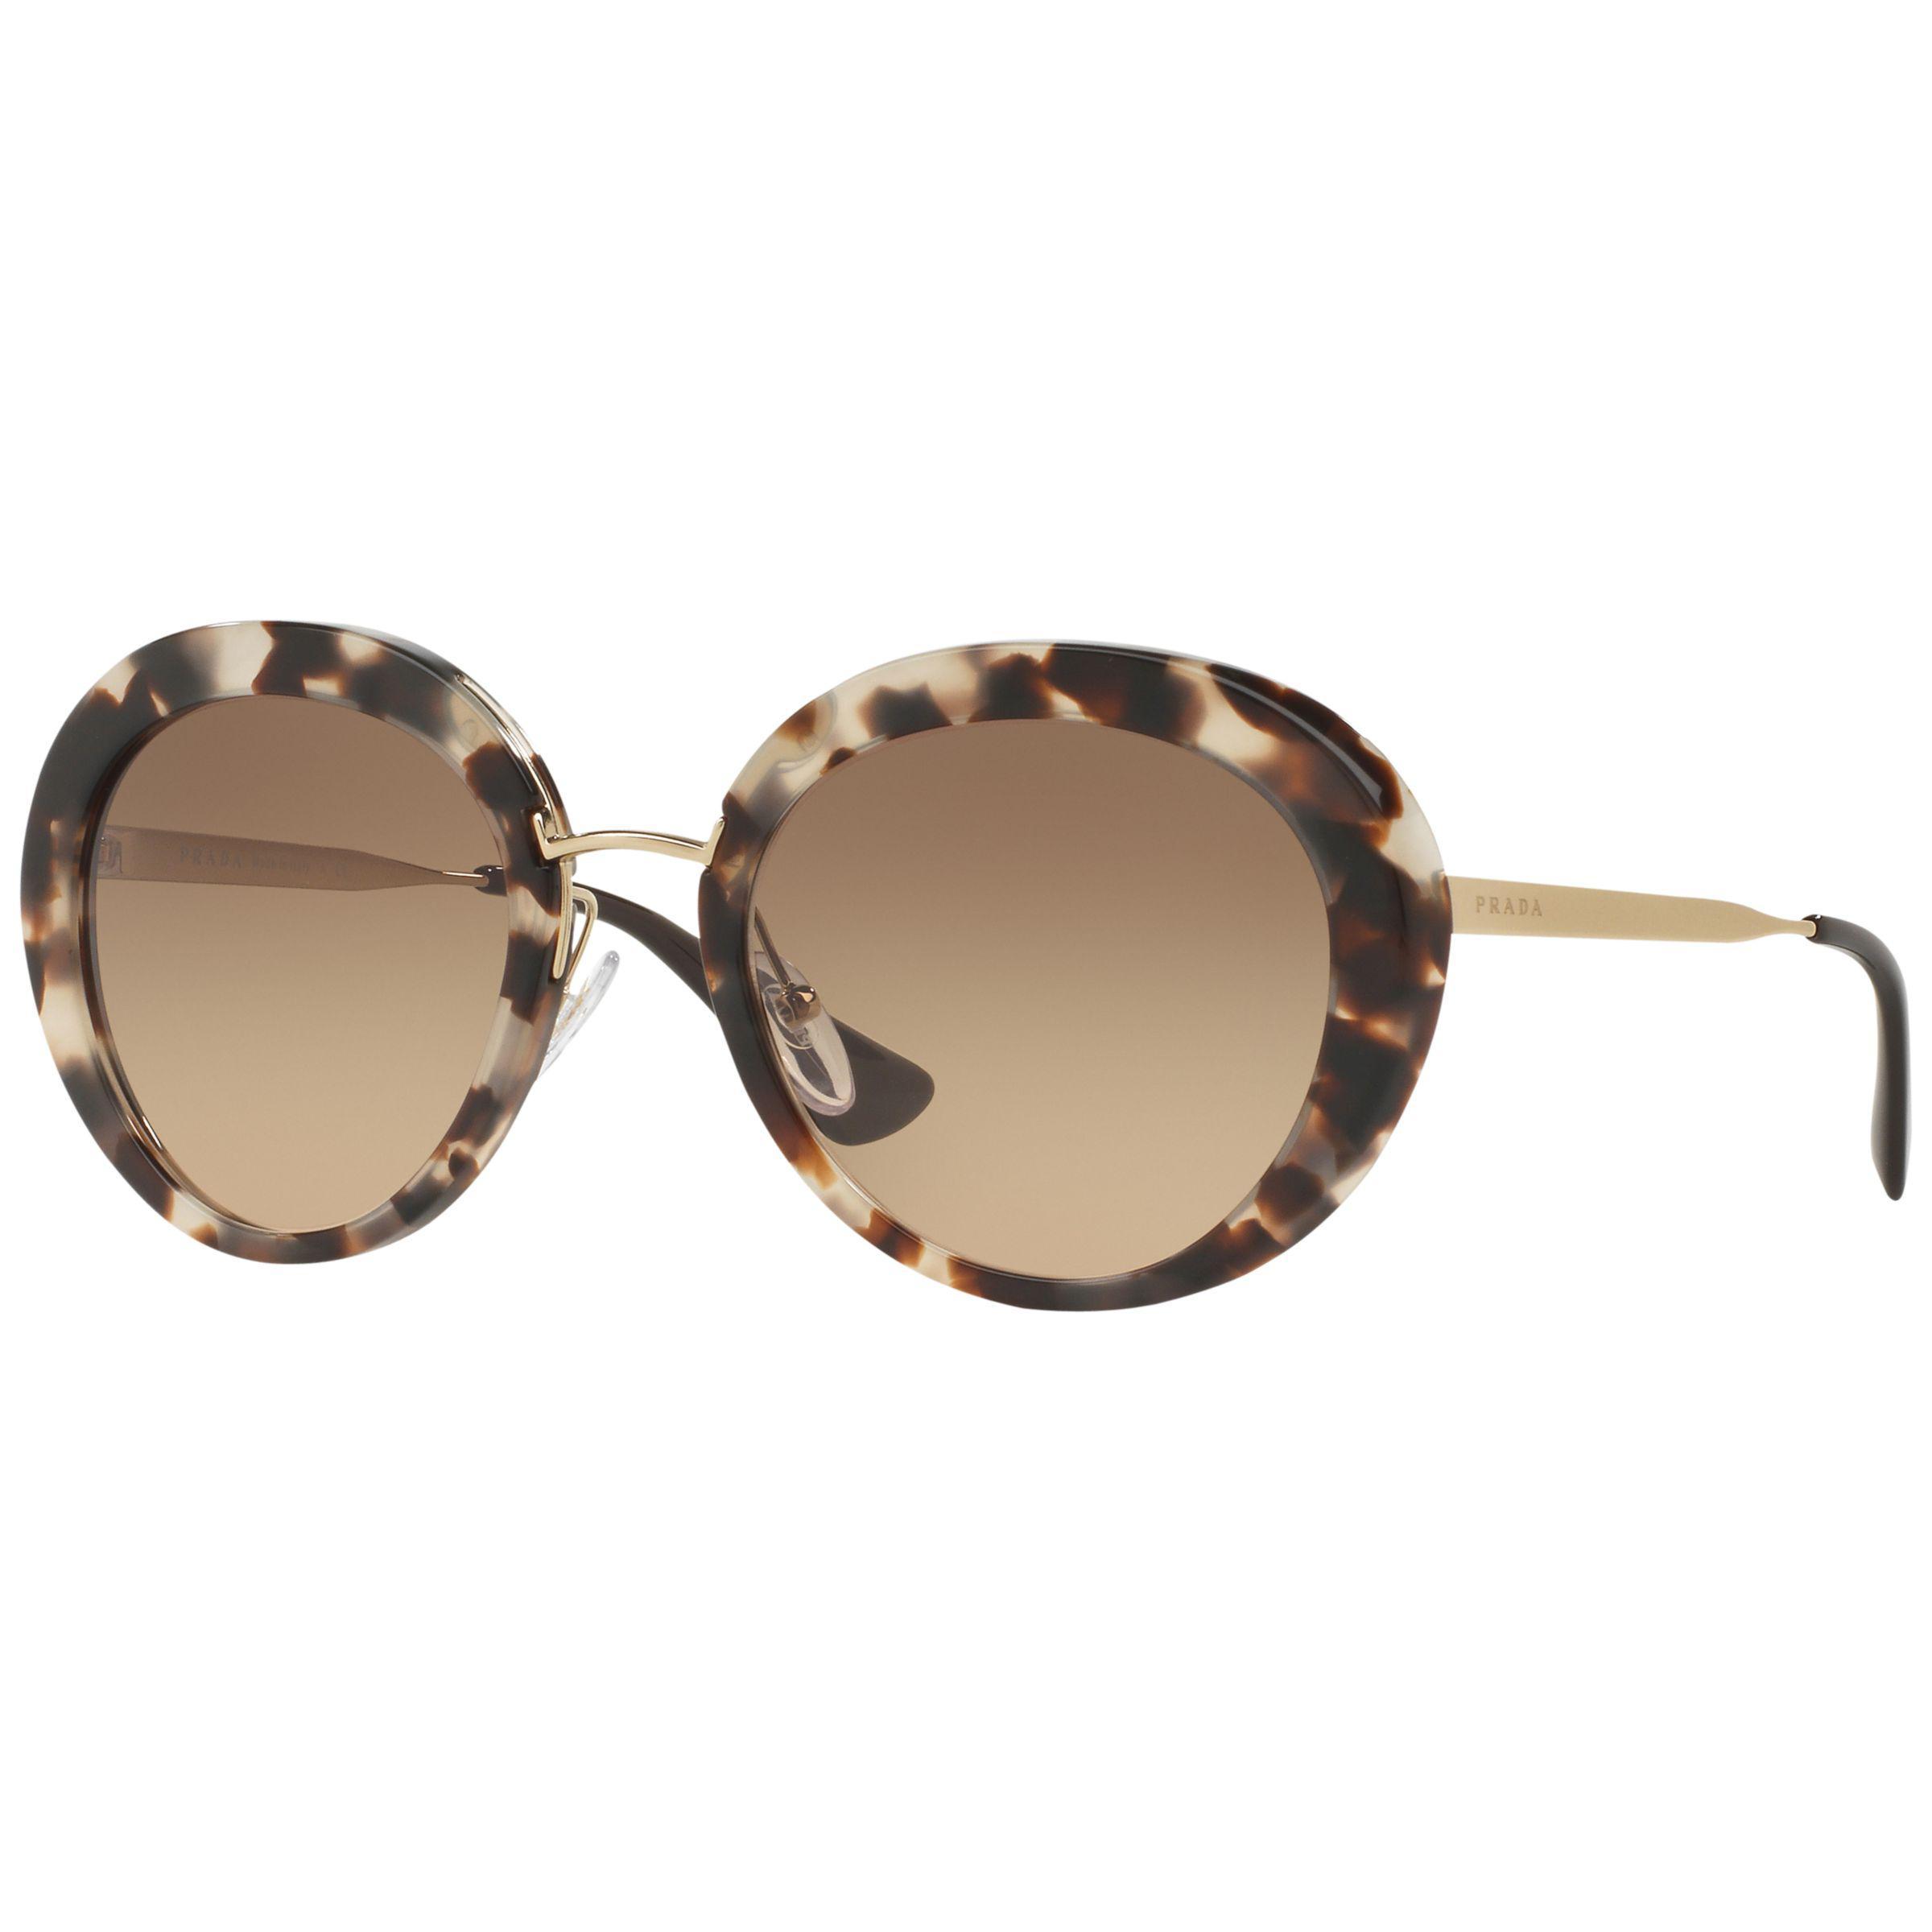 c5171ff57330 Prada Pr16qs Cinema Oval Sunglasses - Lyst